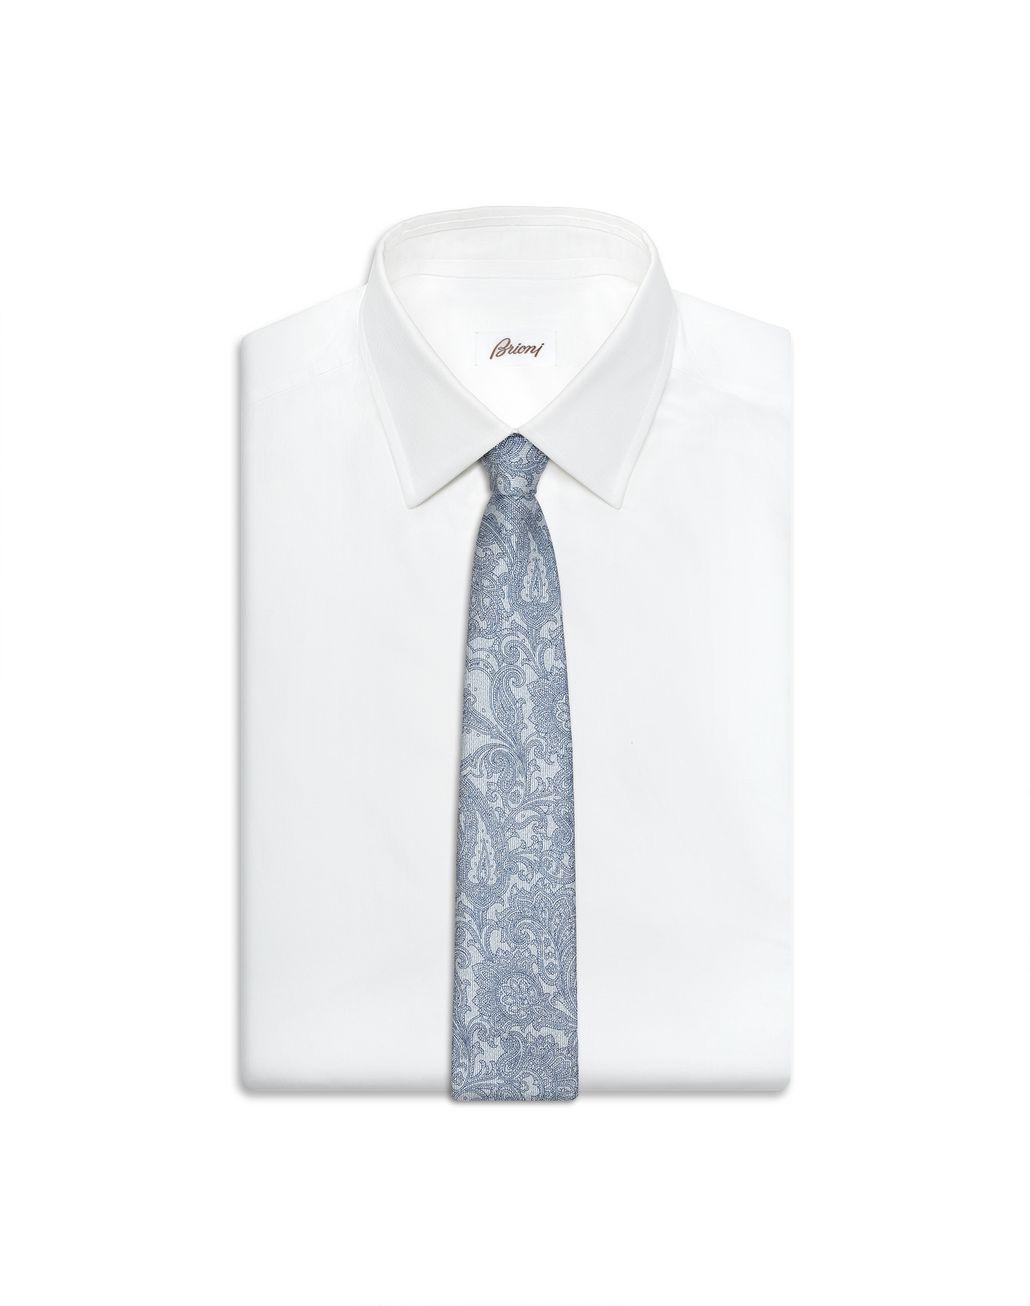 BRIONI Bluette Paisley Tie Tie Man e